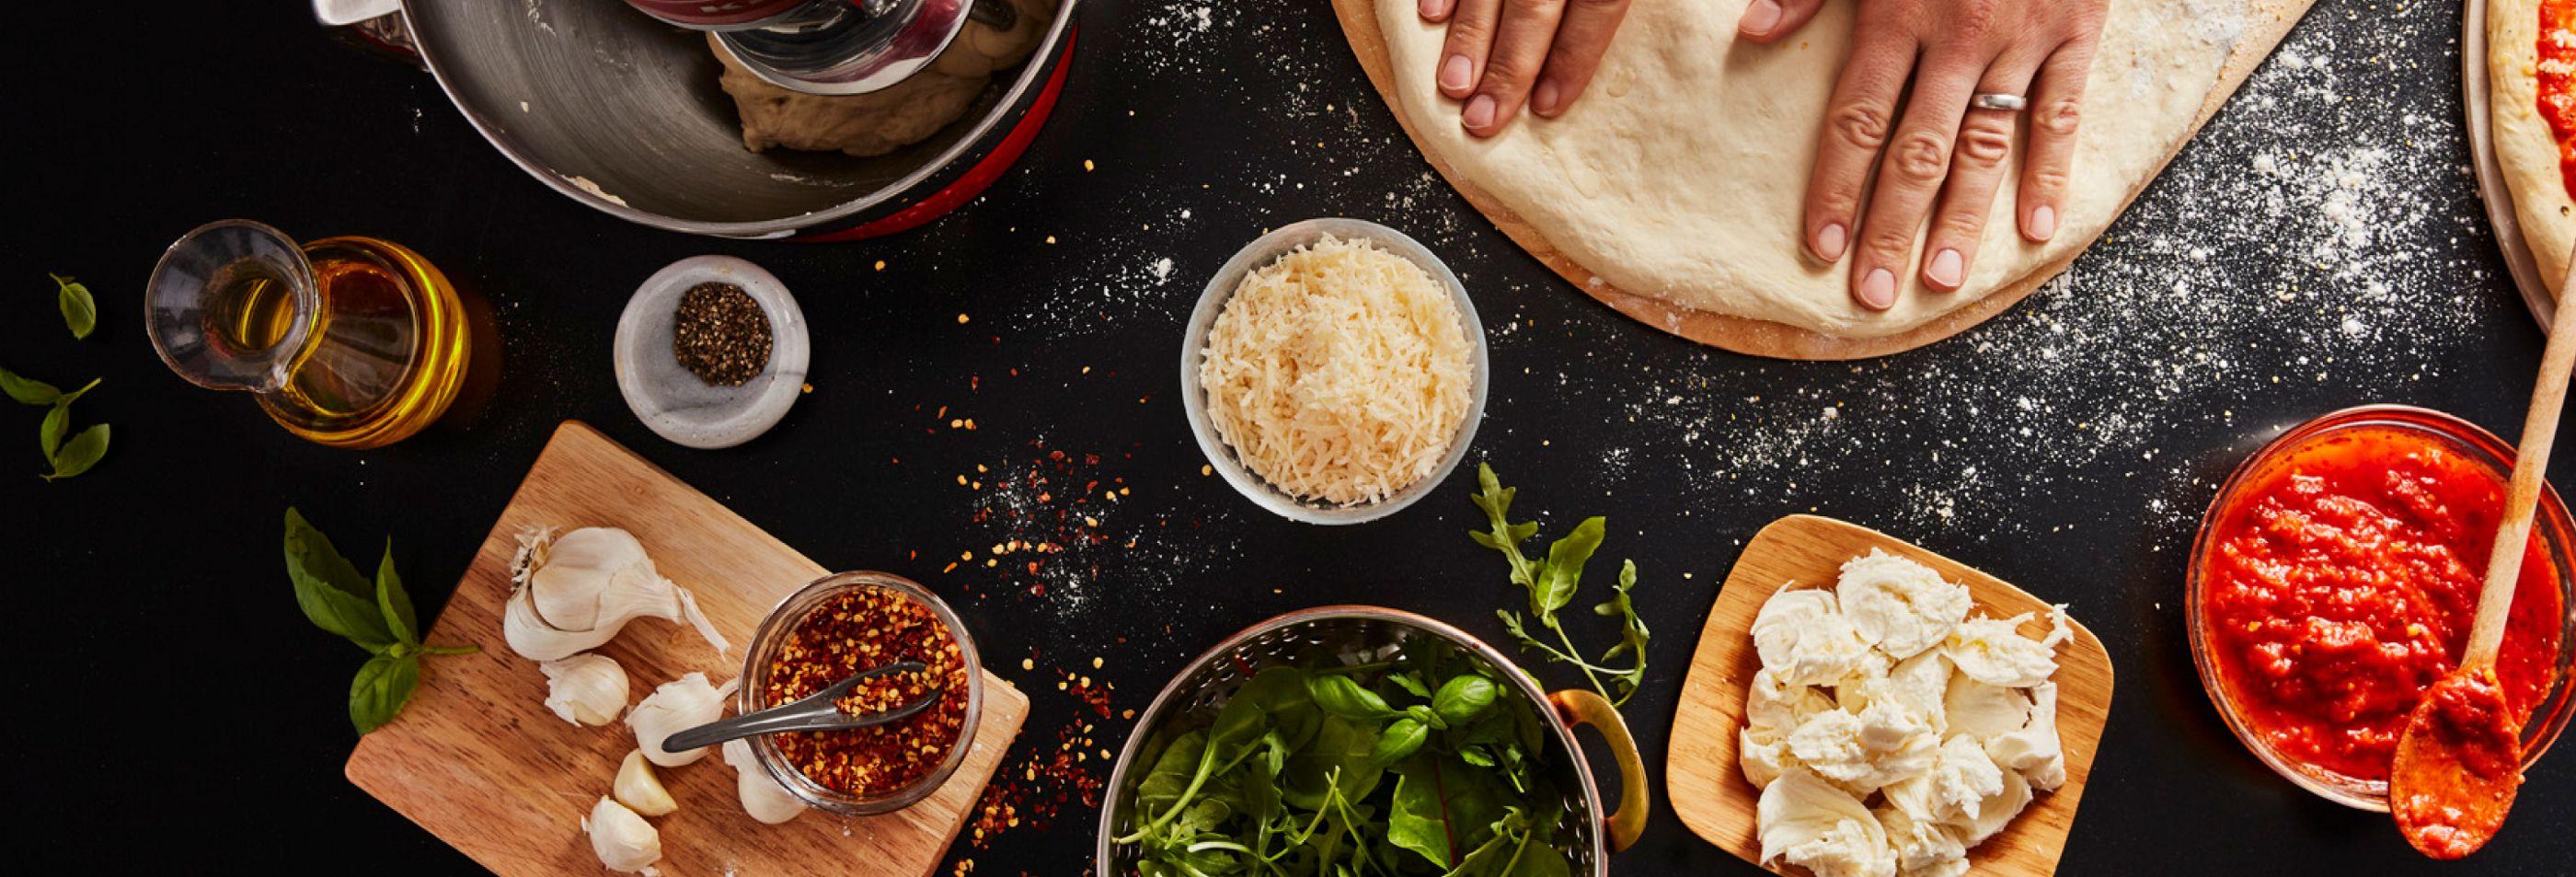 Preparing flatbread pizza with a KitchenAid® Stand Mixer.